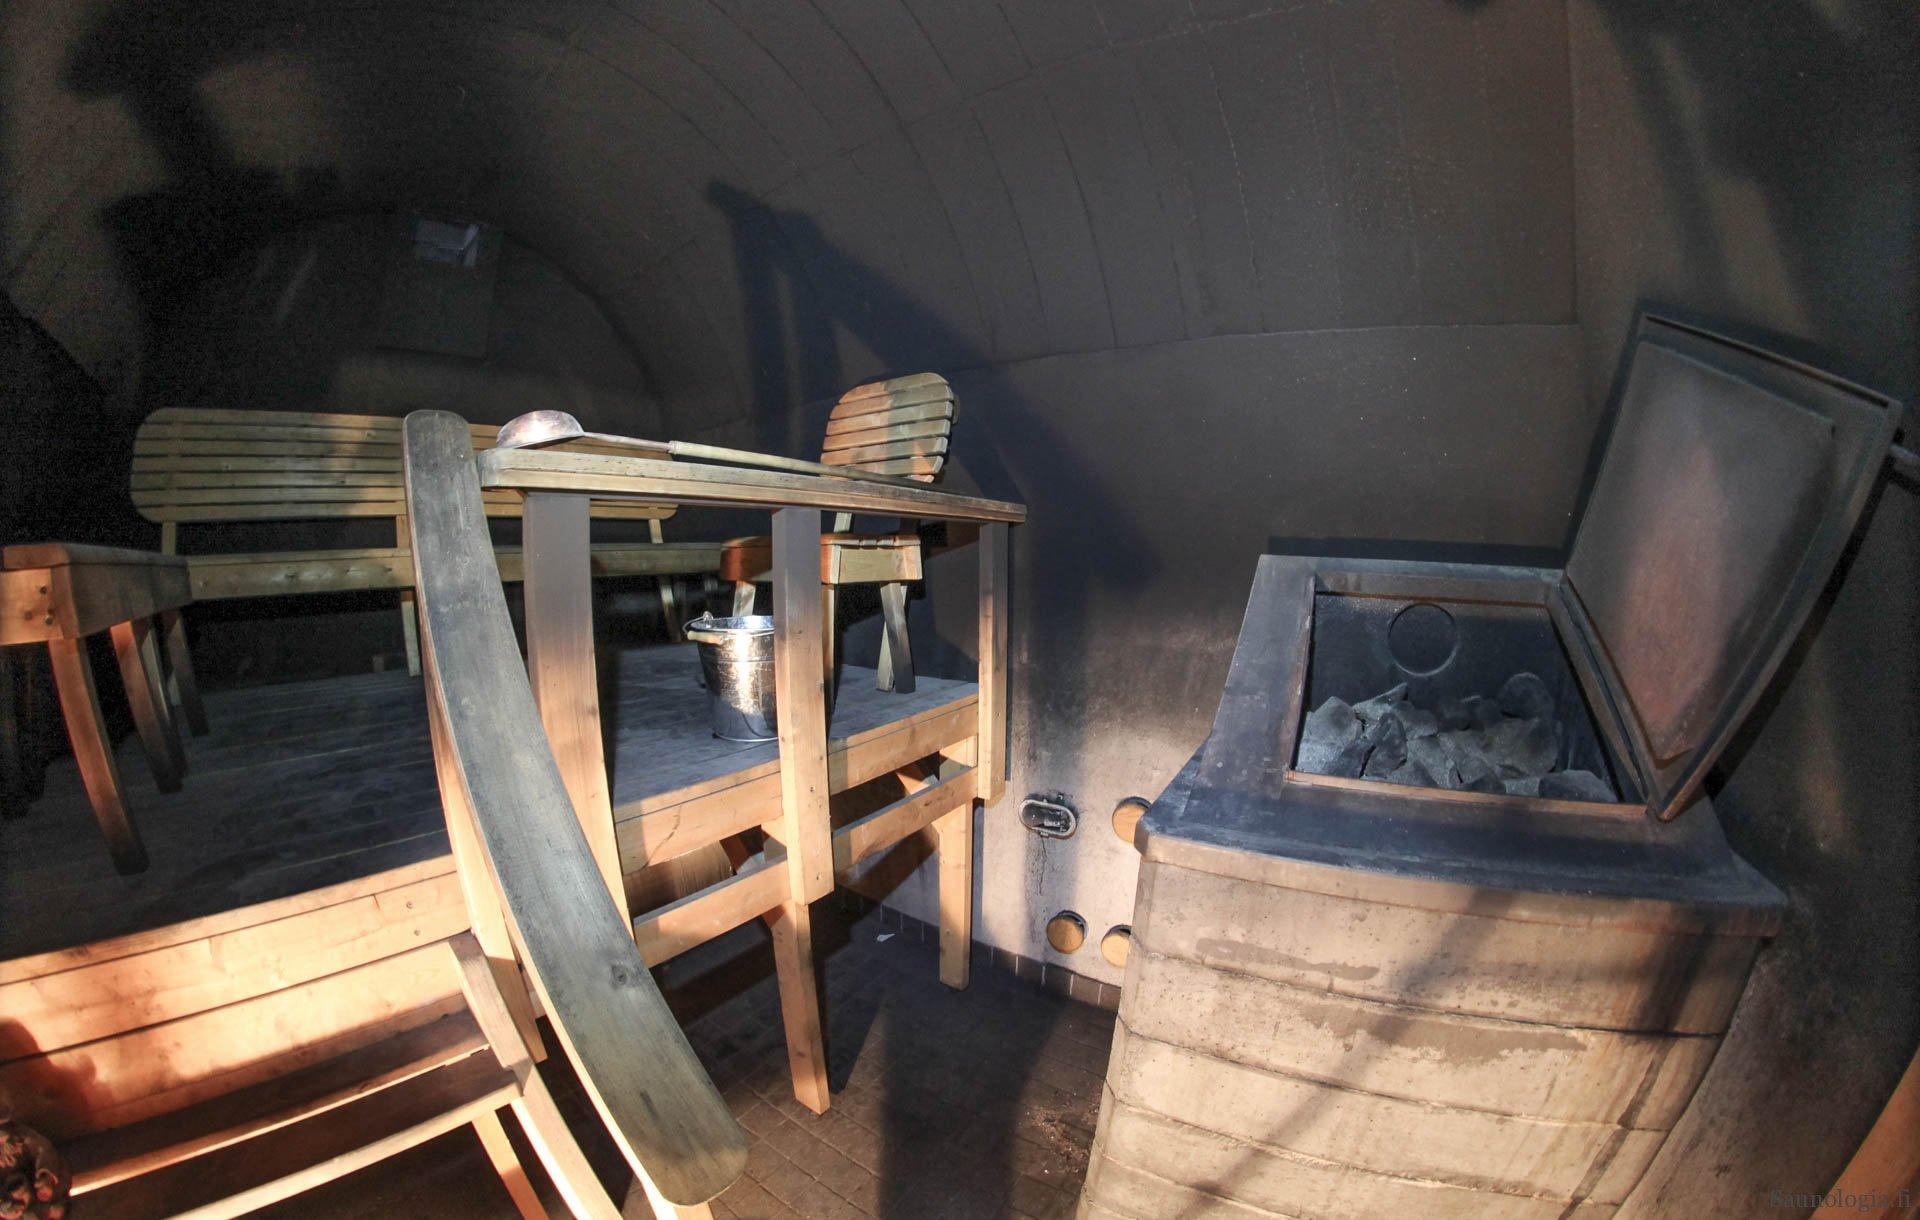 180418-holvisauna-uunisauna-kalansilma-0772